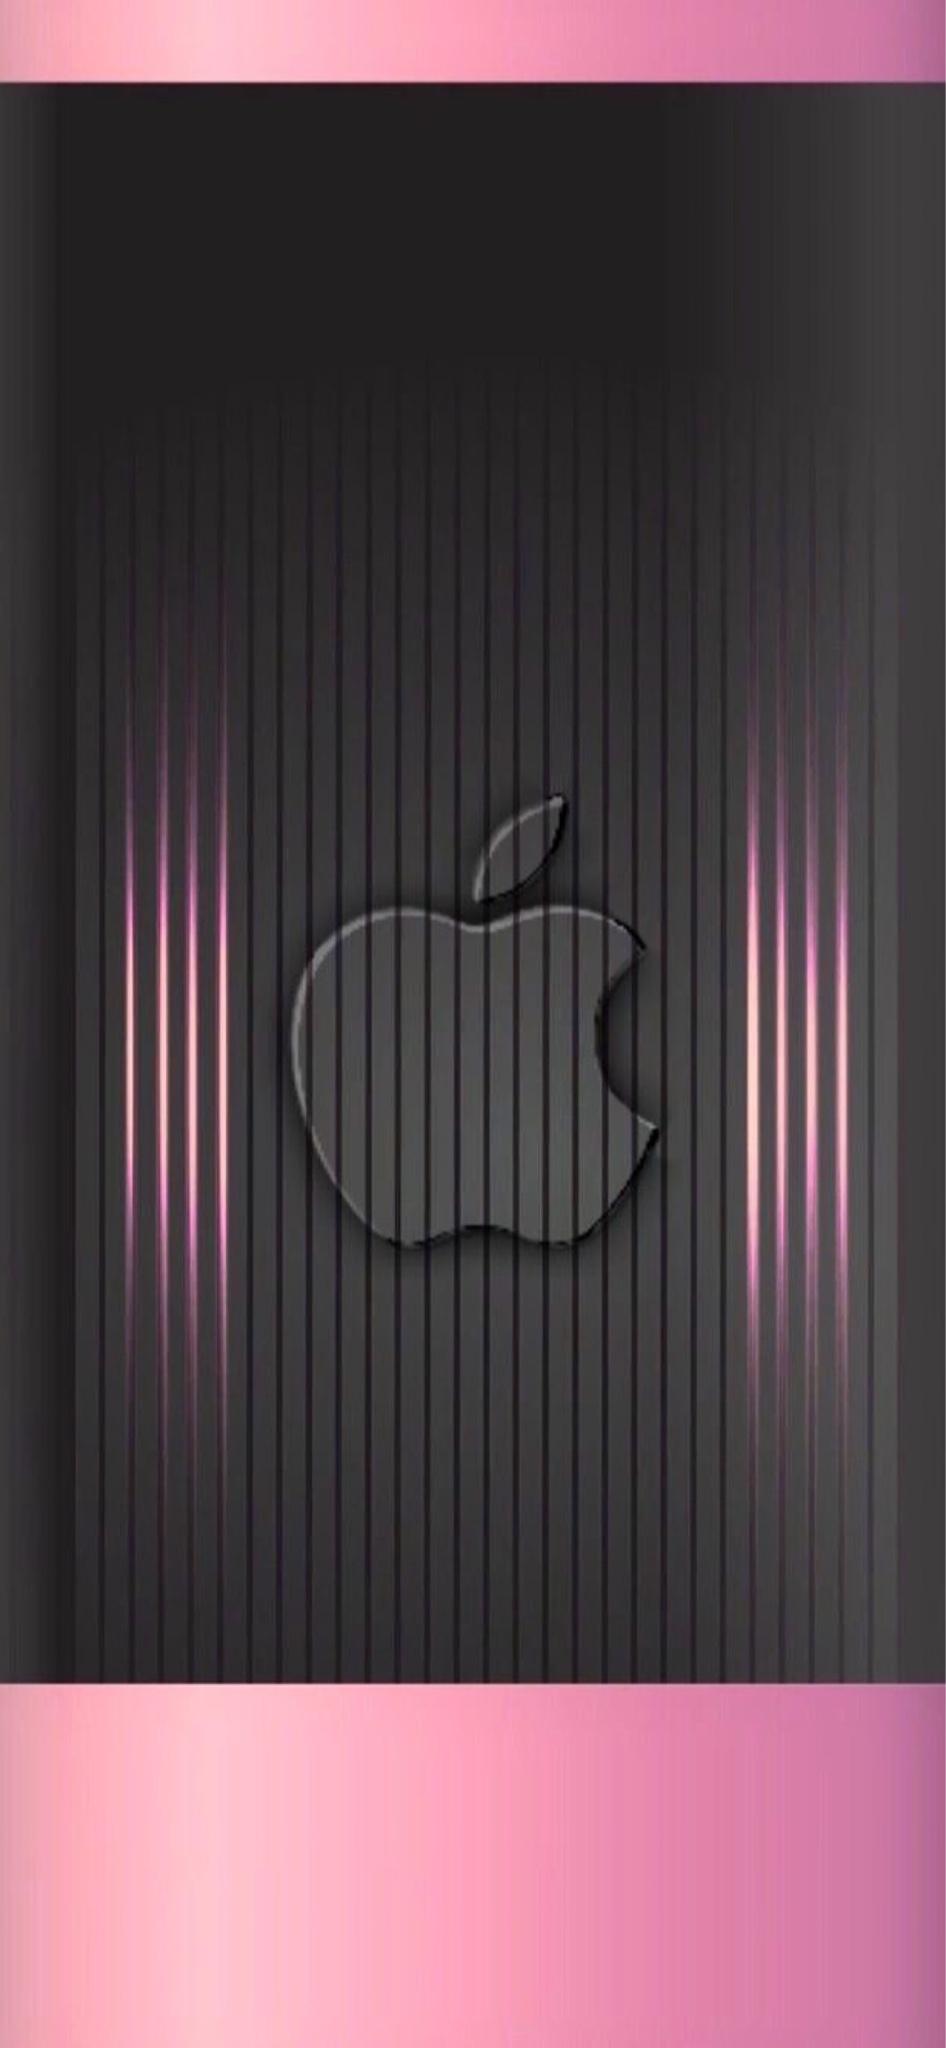 The iPhone XS Max/Pro Max Wallpaper